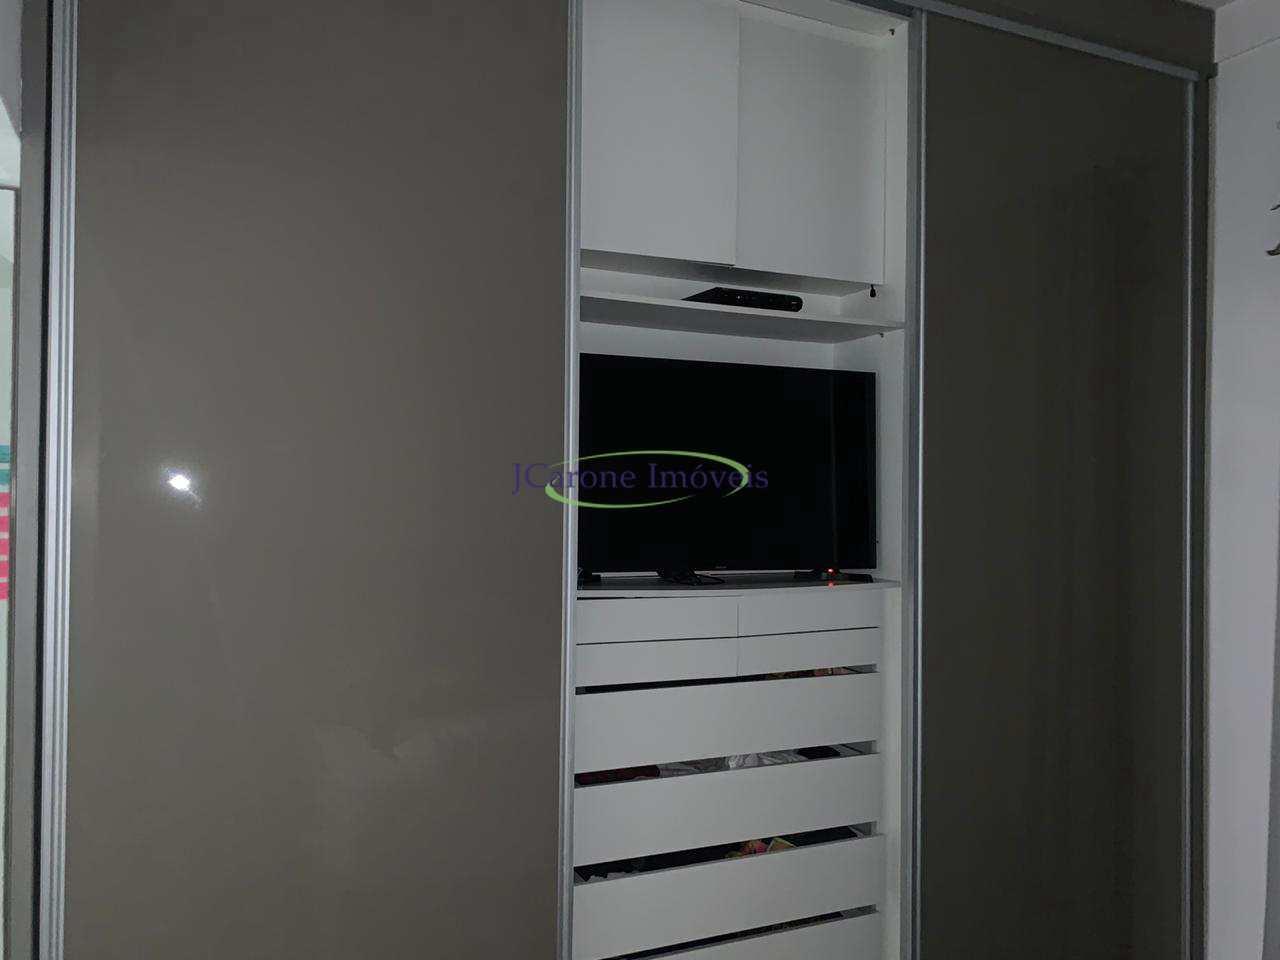 Casa com 2 dorms, Embaré, Santos - R$ 1.08 mi, Cod: 64152503